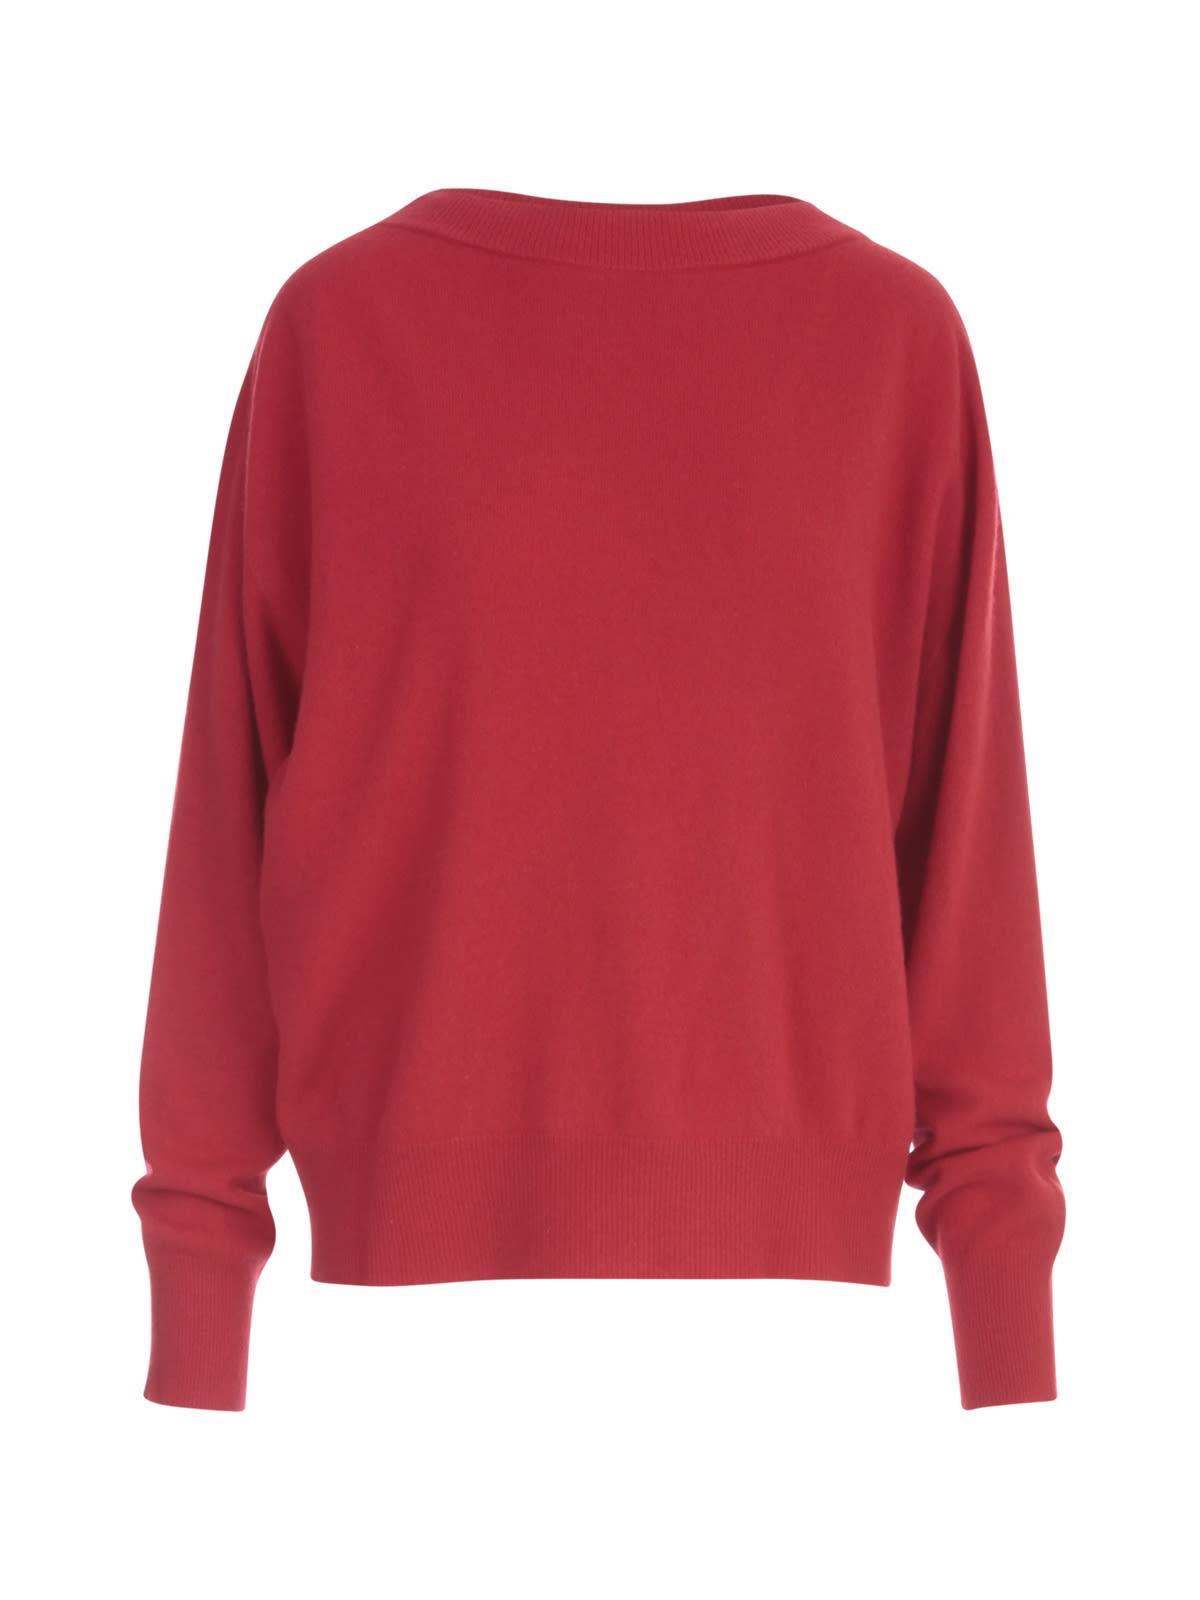 Crew Neck L/s Sweater